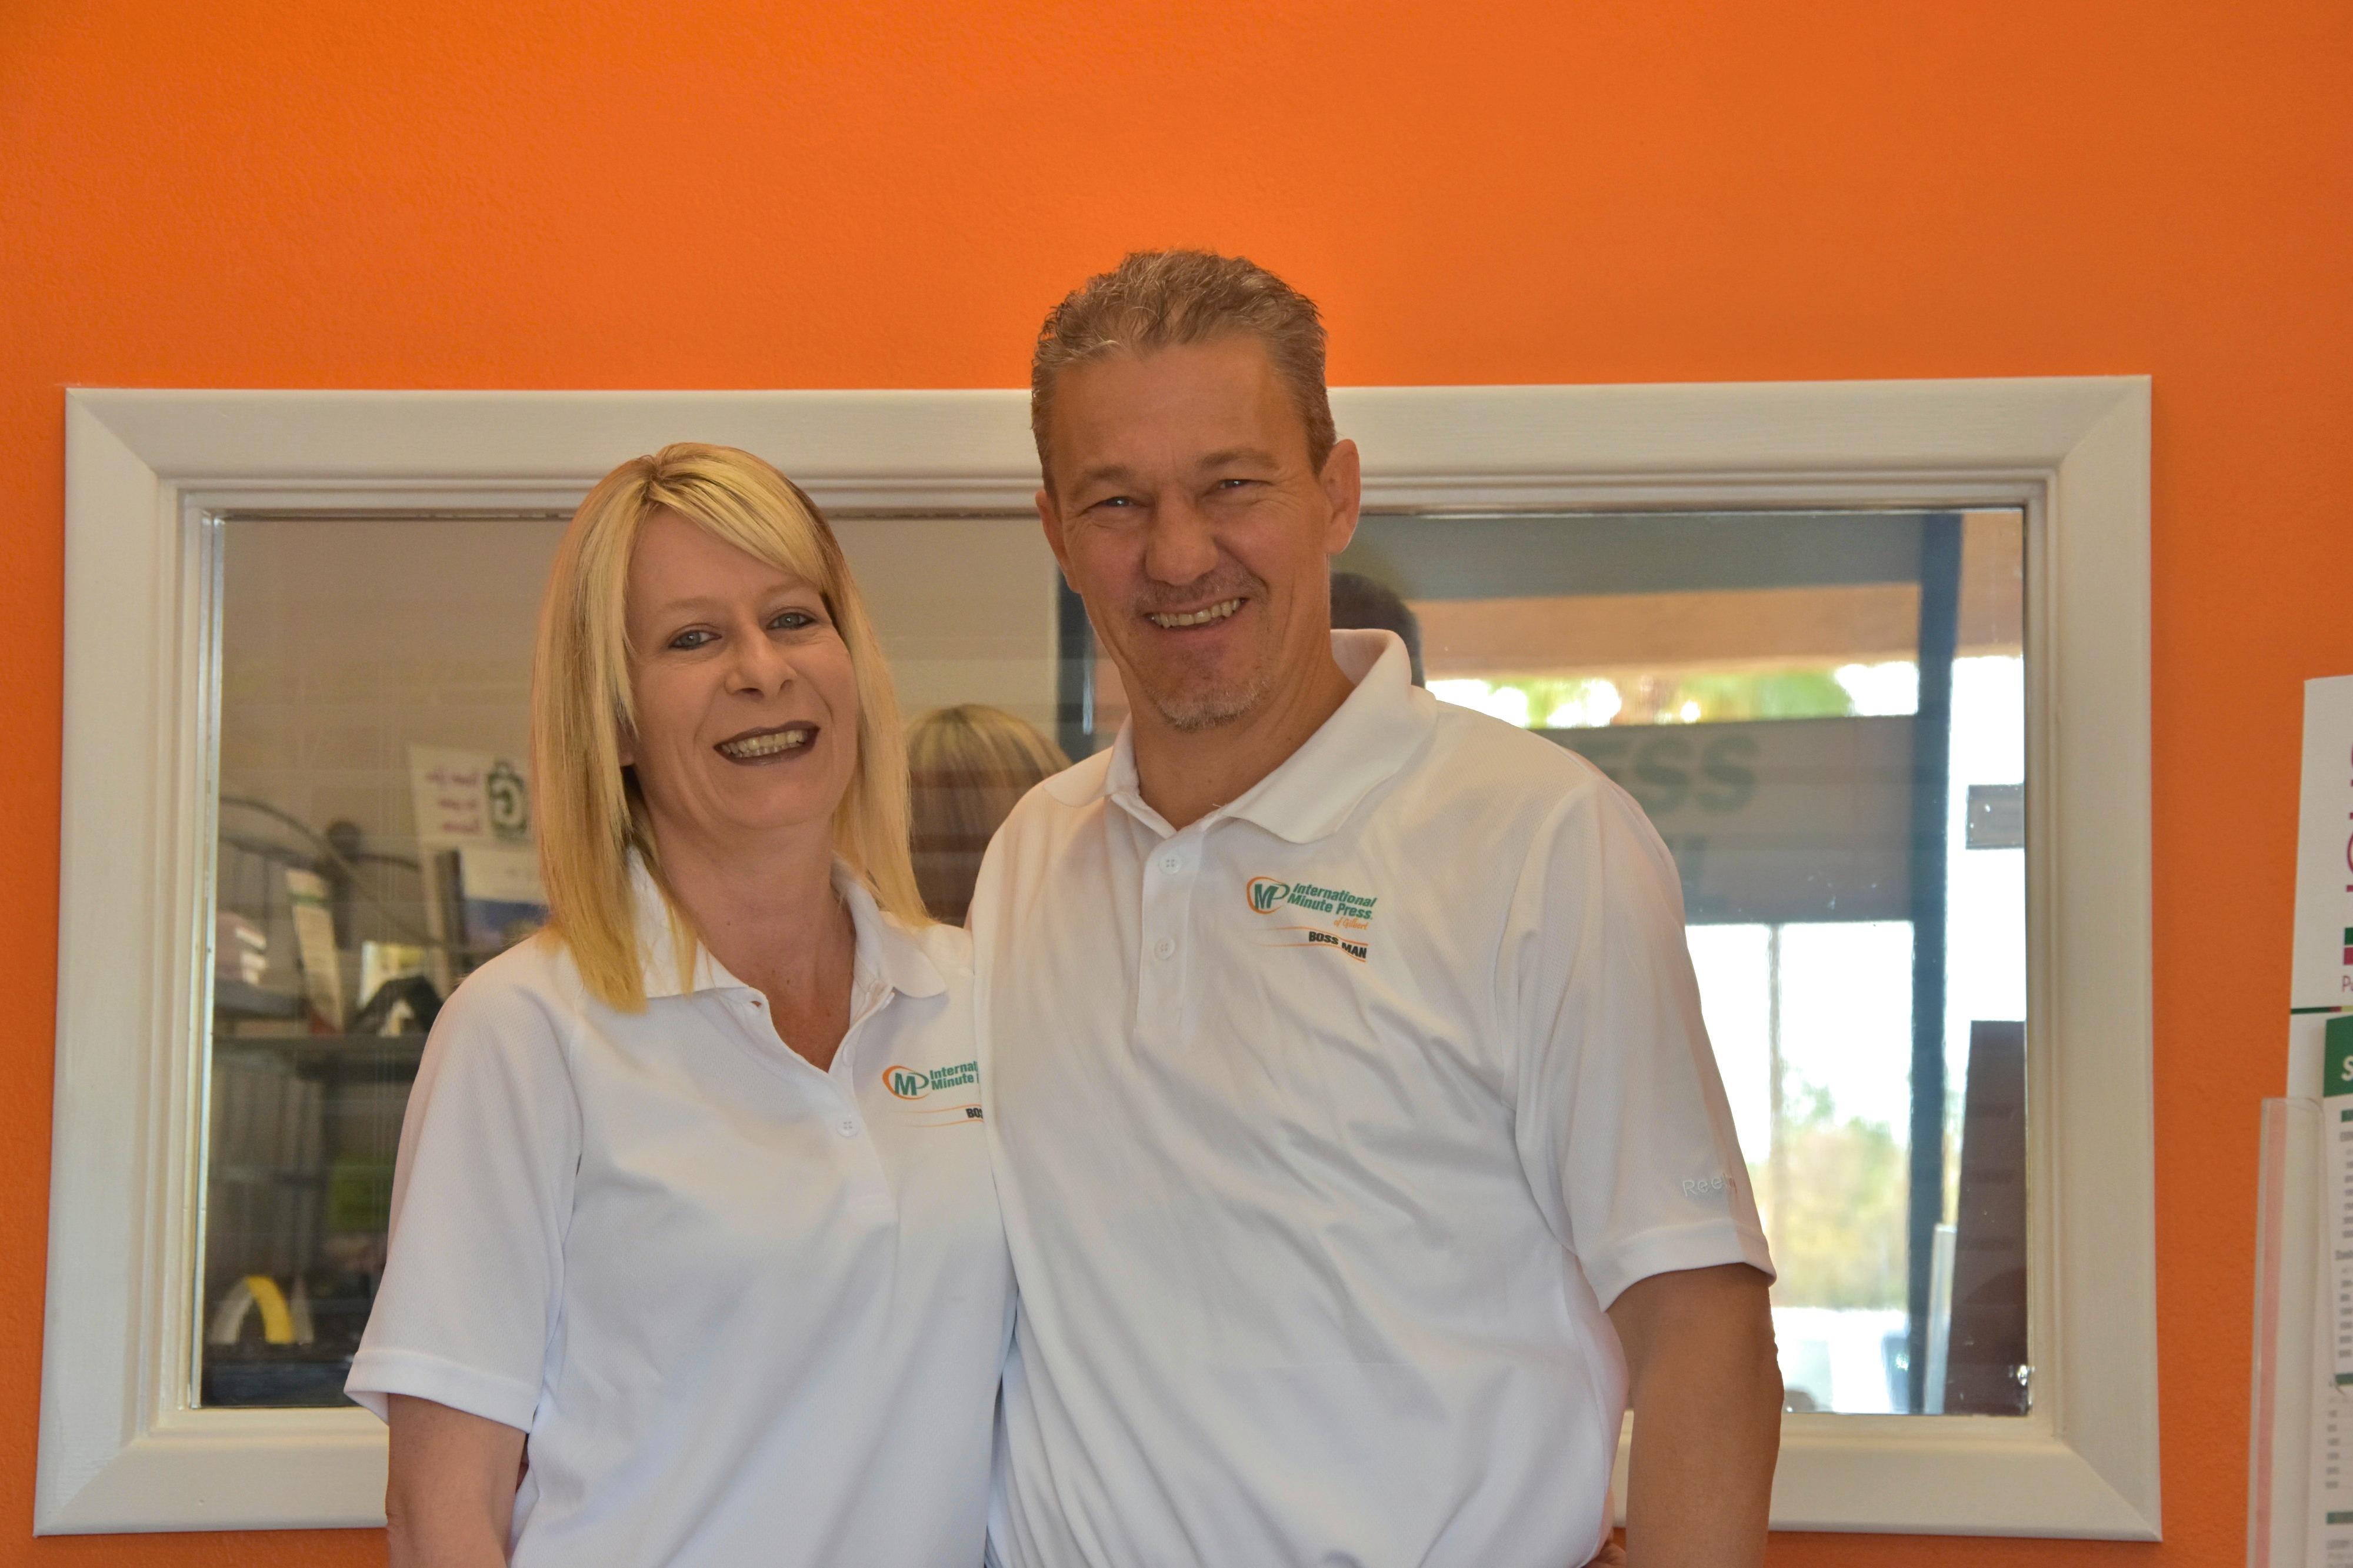 Angel and David Rindfleisch, Owners, International Minute Press, Gilbert, AZ. http://www.minutemanpressfranchise.com